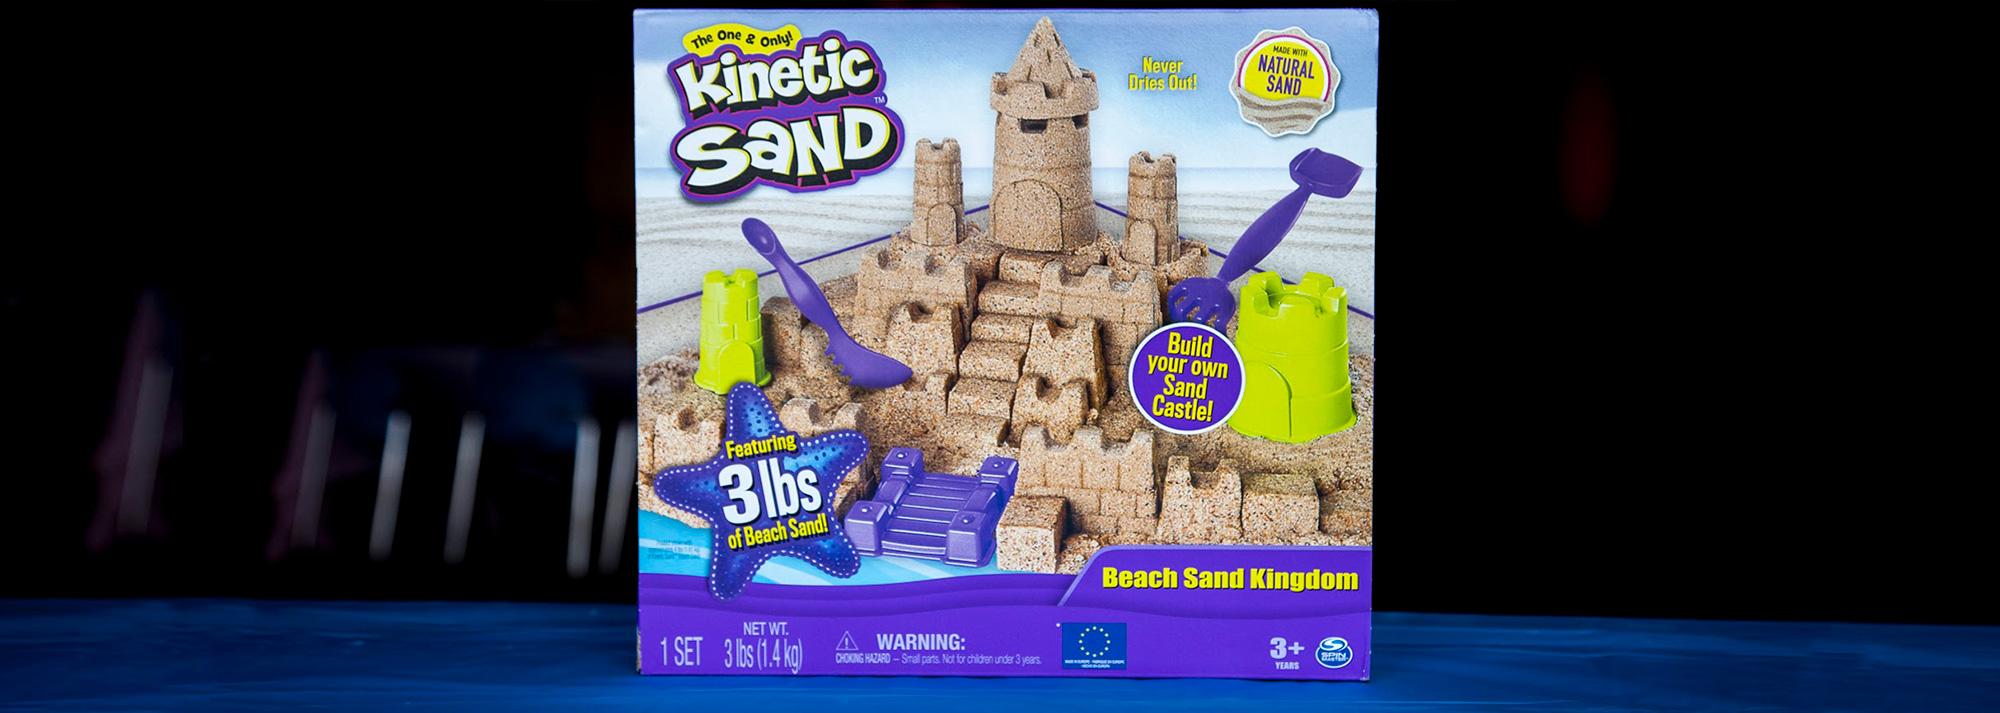 kinetic-sand